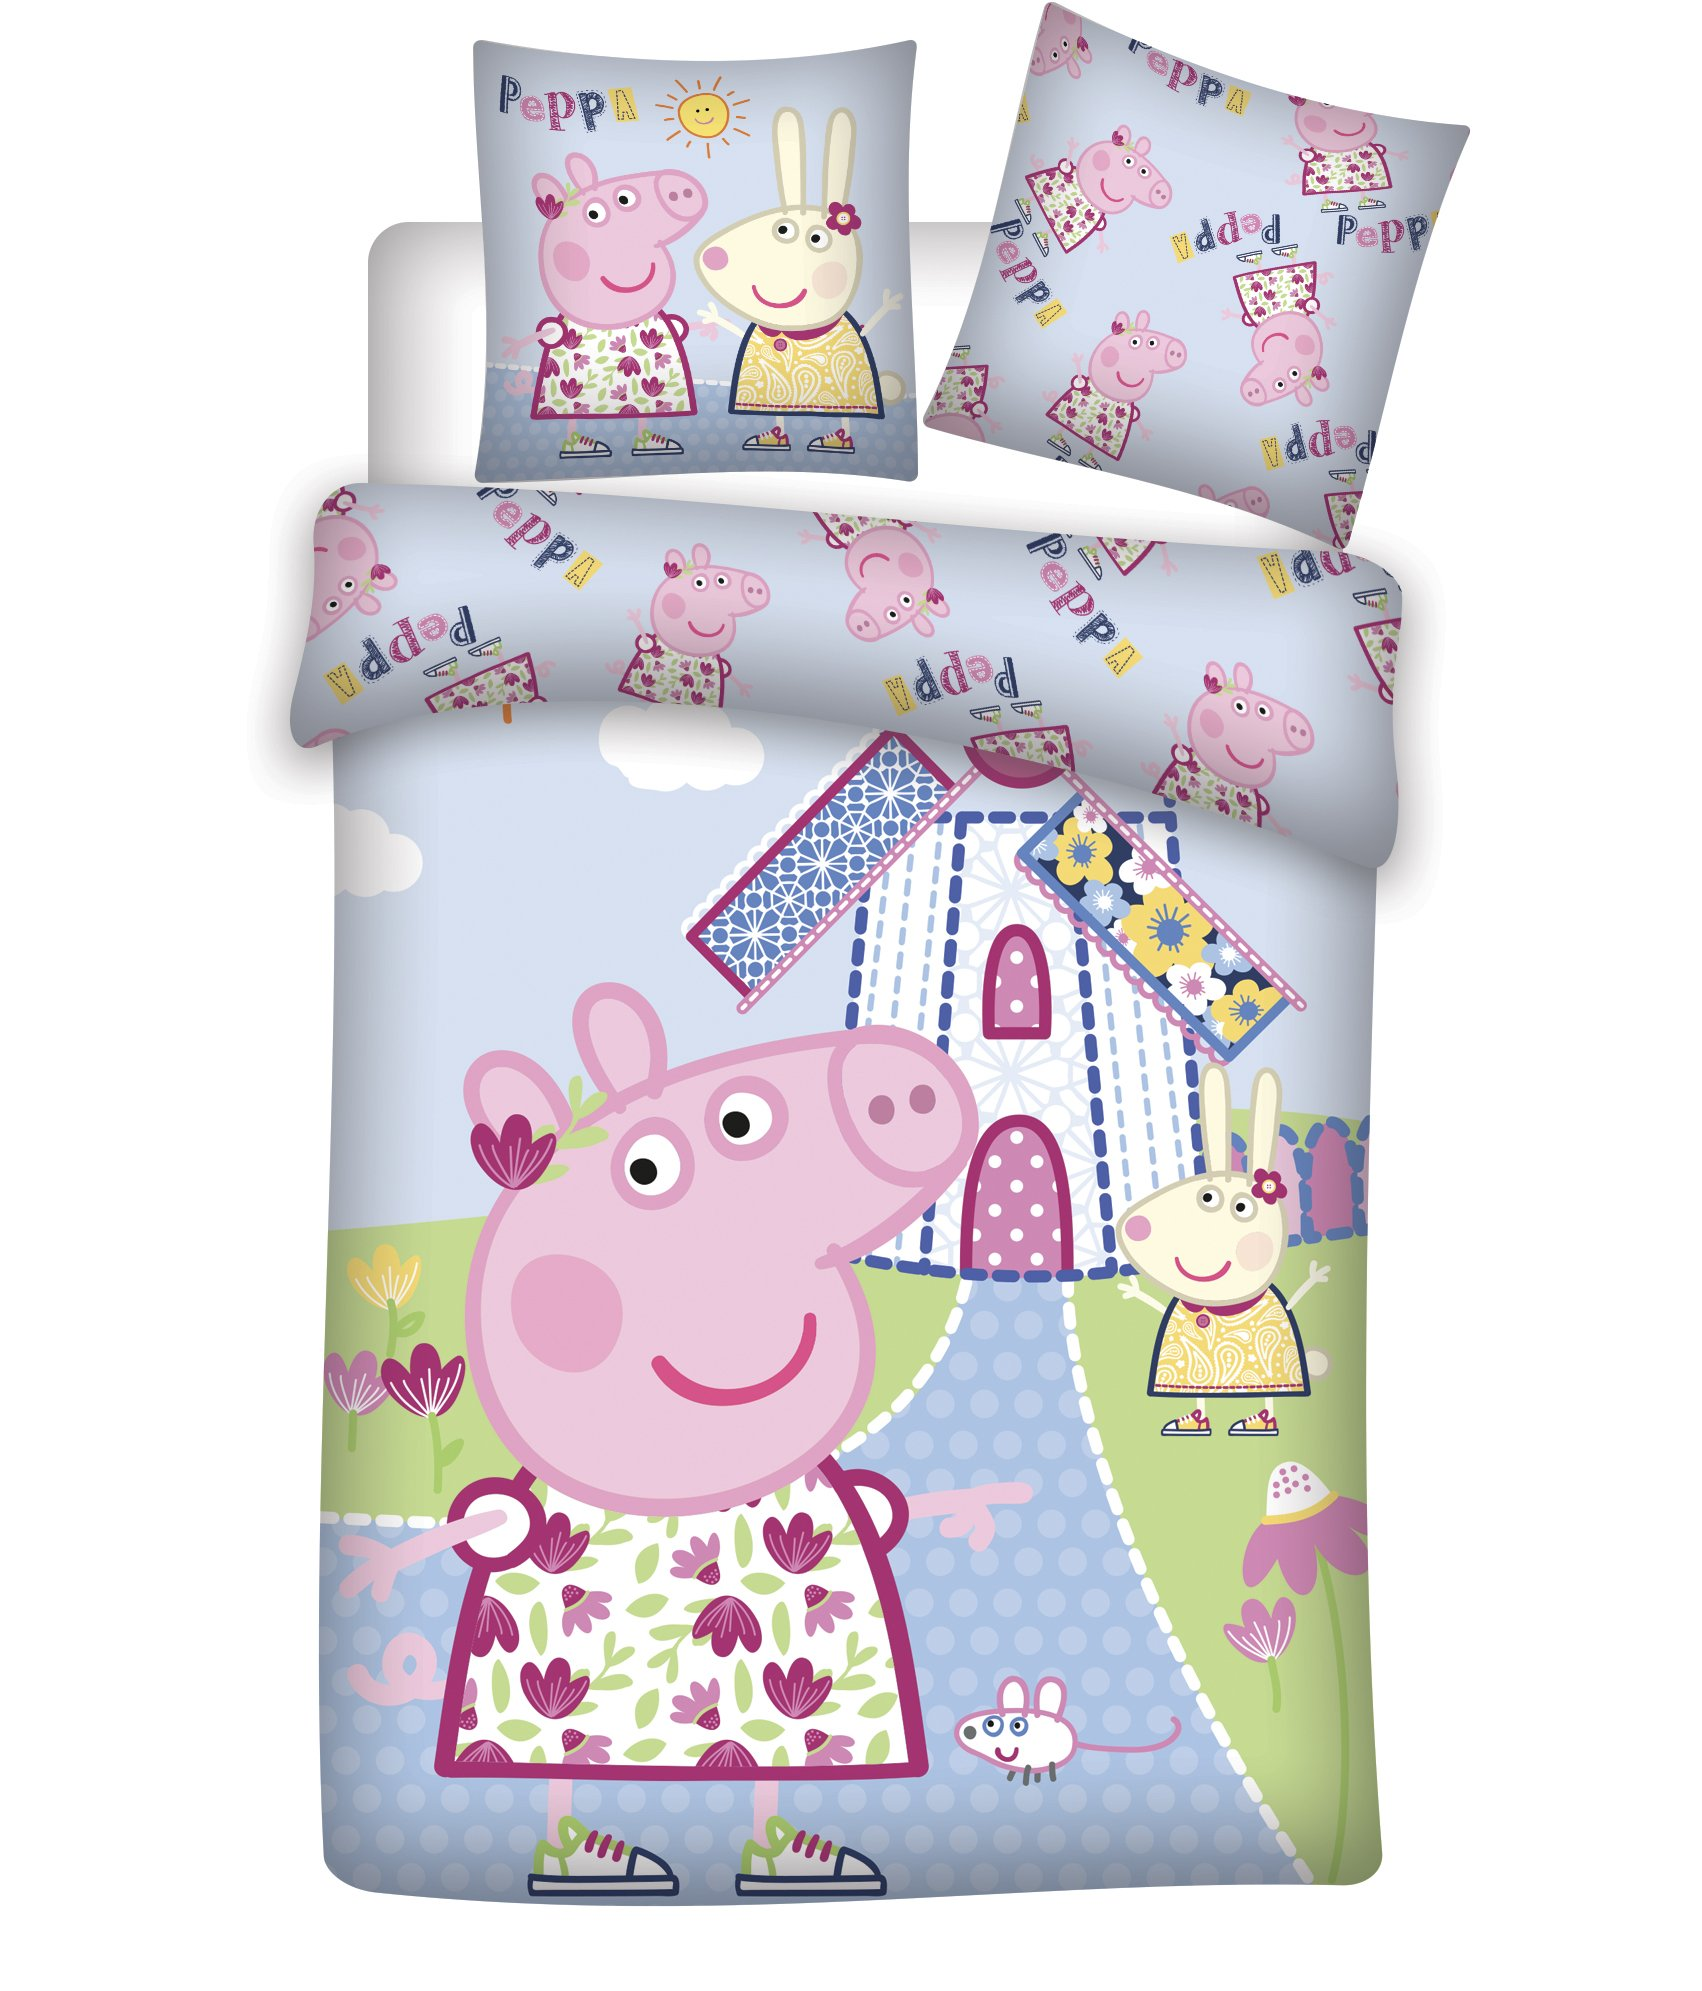 Bed Linen - Junior Size 100 x 140 cm - Peppa Pig (1000382)